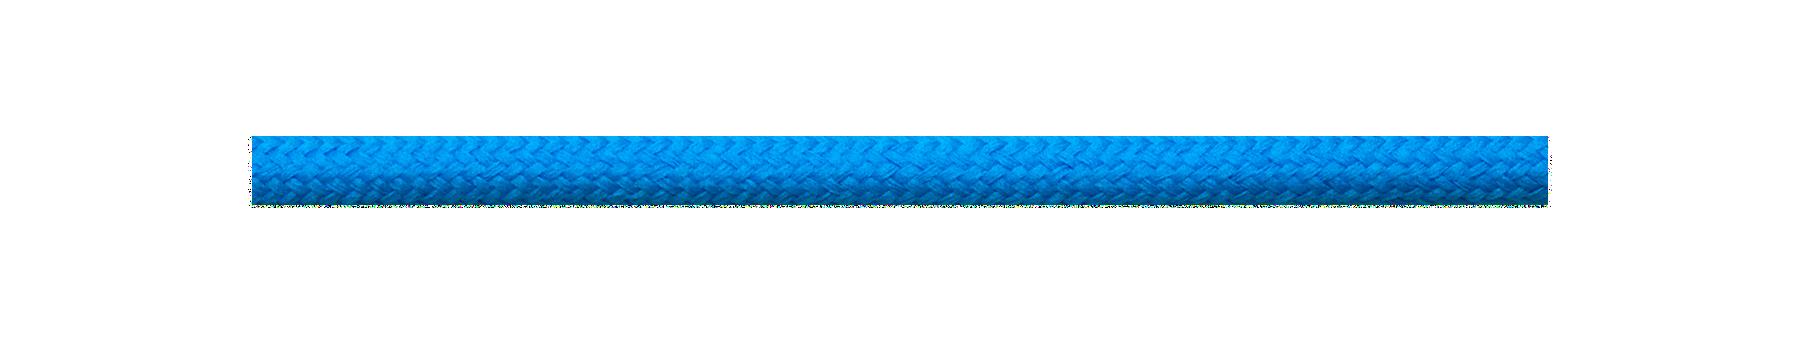 Textilkabel Blau-Türkis